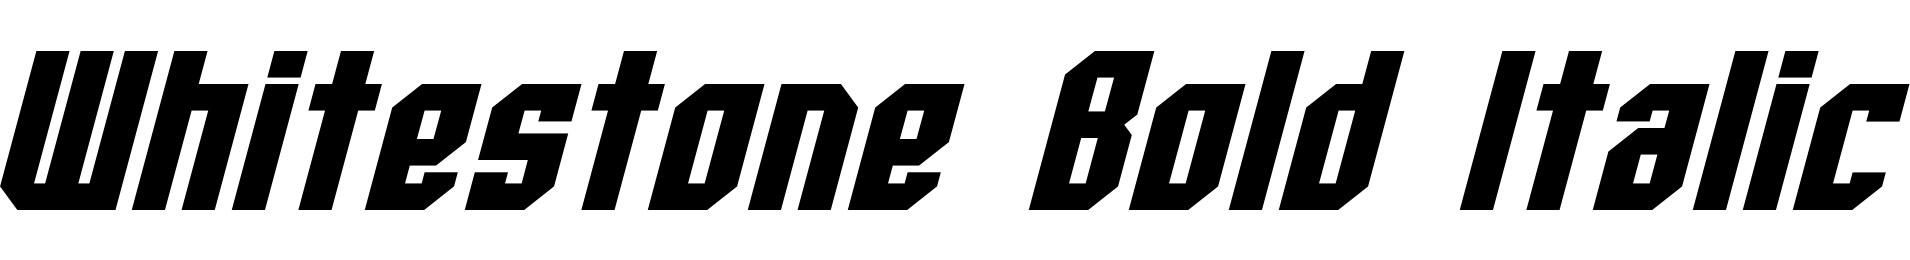 Whitestone Bold Italic